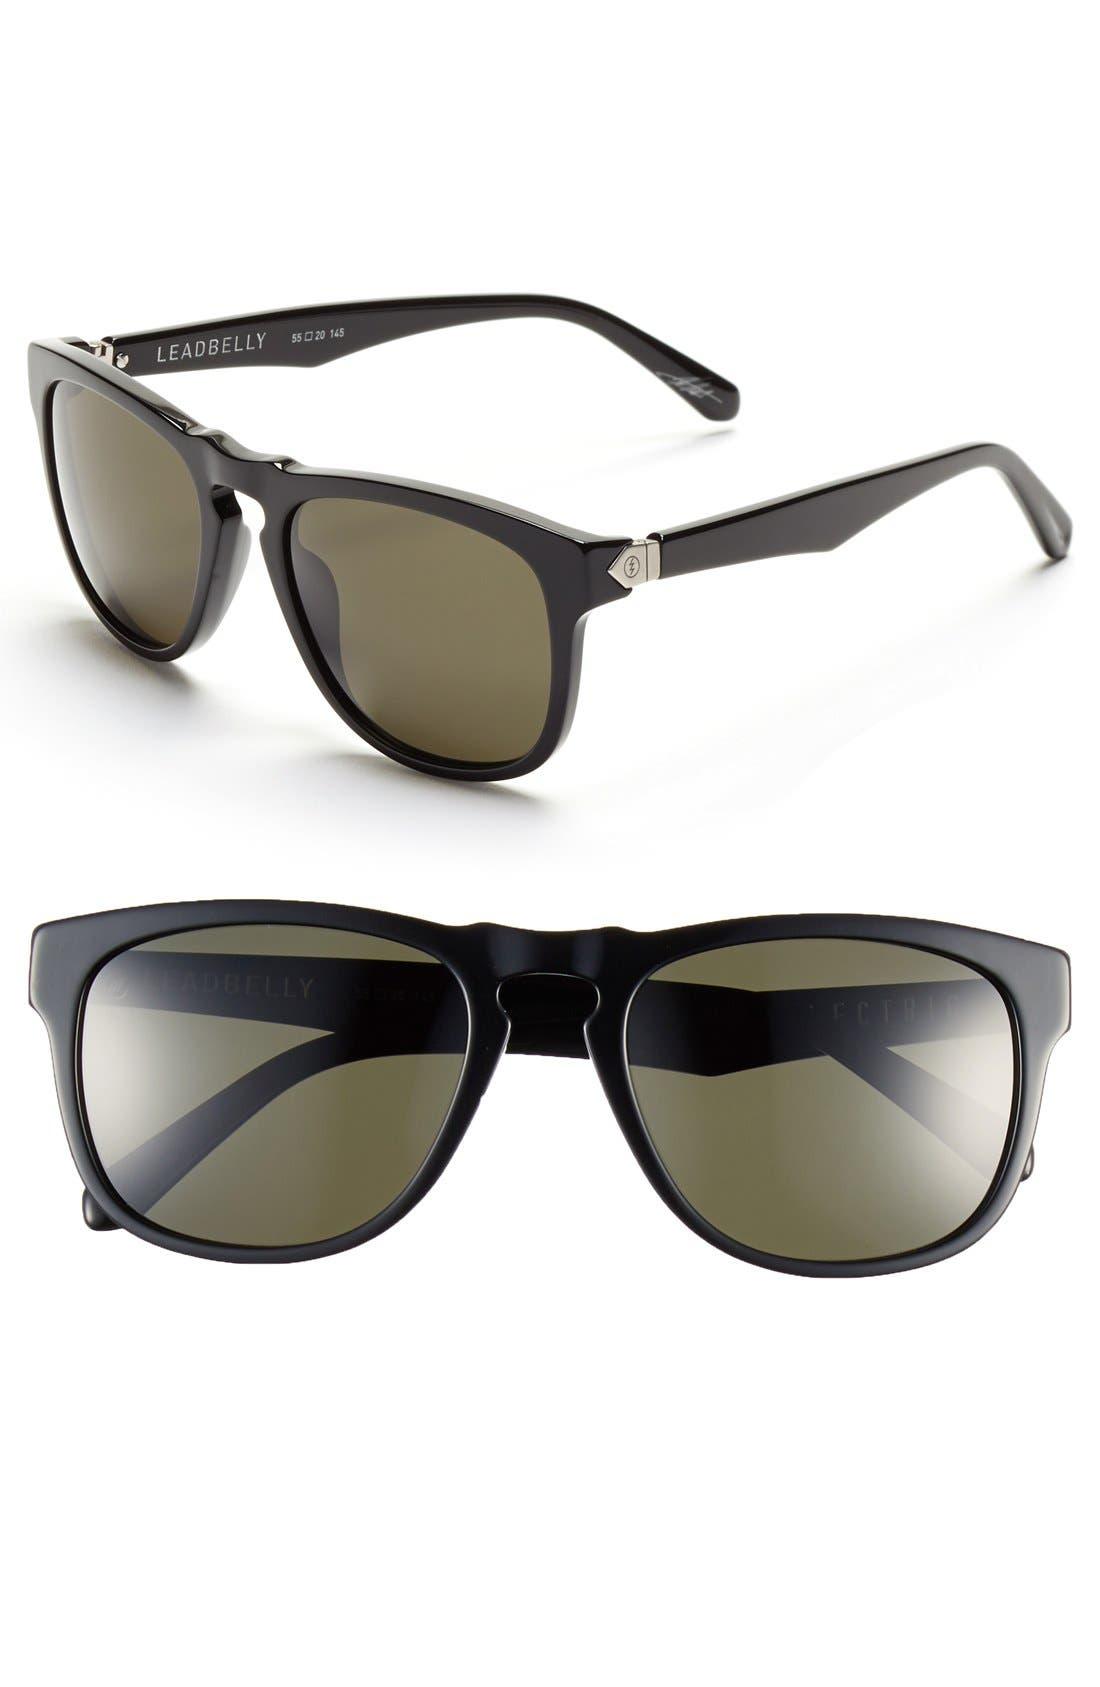 'Leadbelly' 55mm Sunglasses,                             Main thumbnail 1, color,                             Gloss Black/ Grey